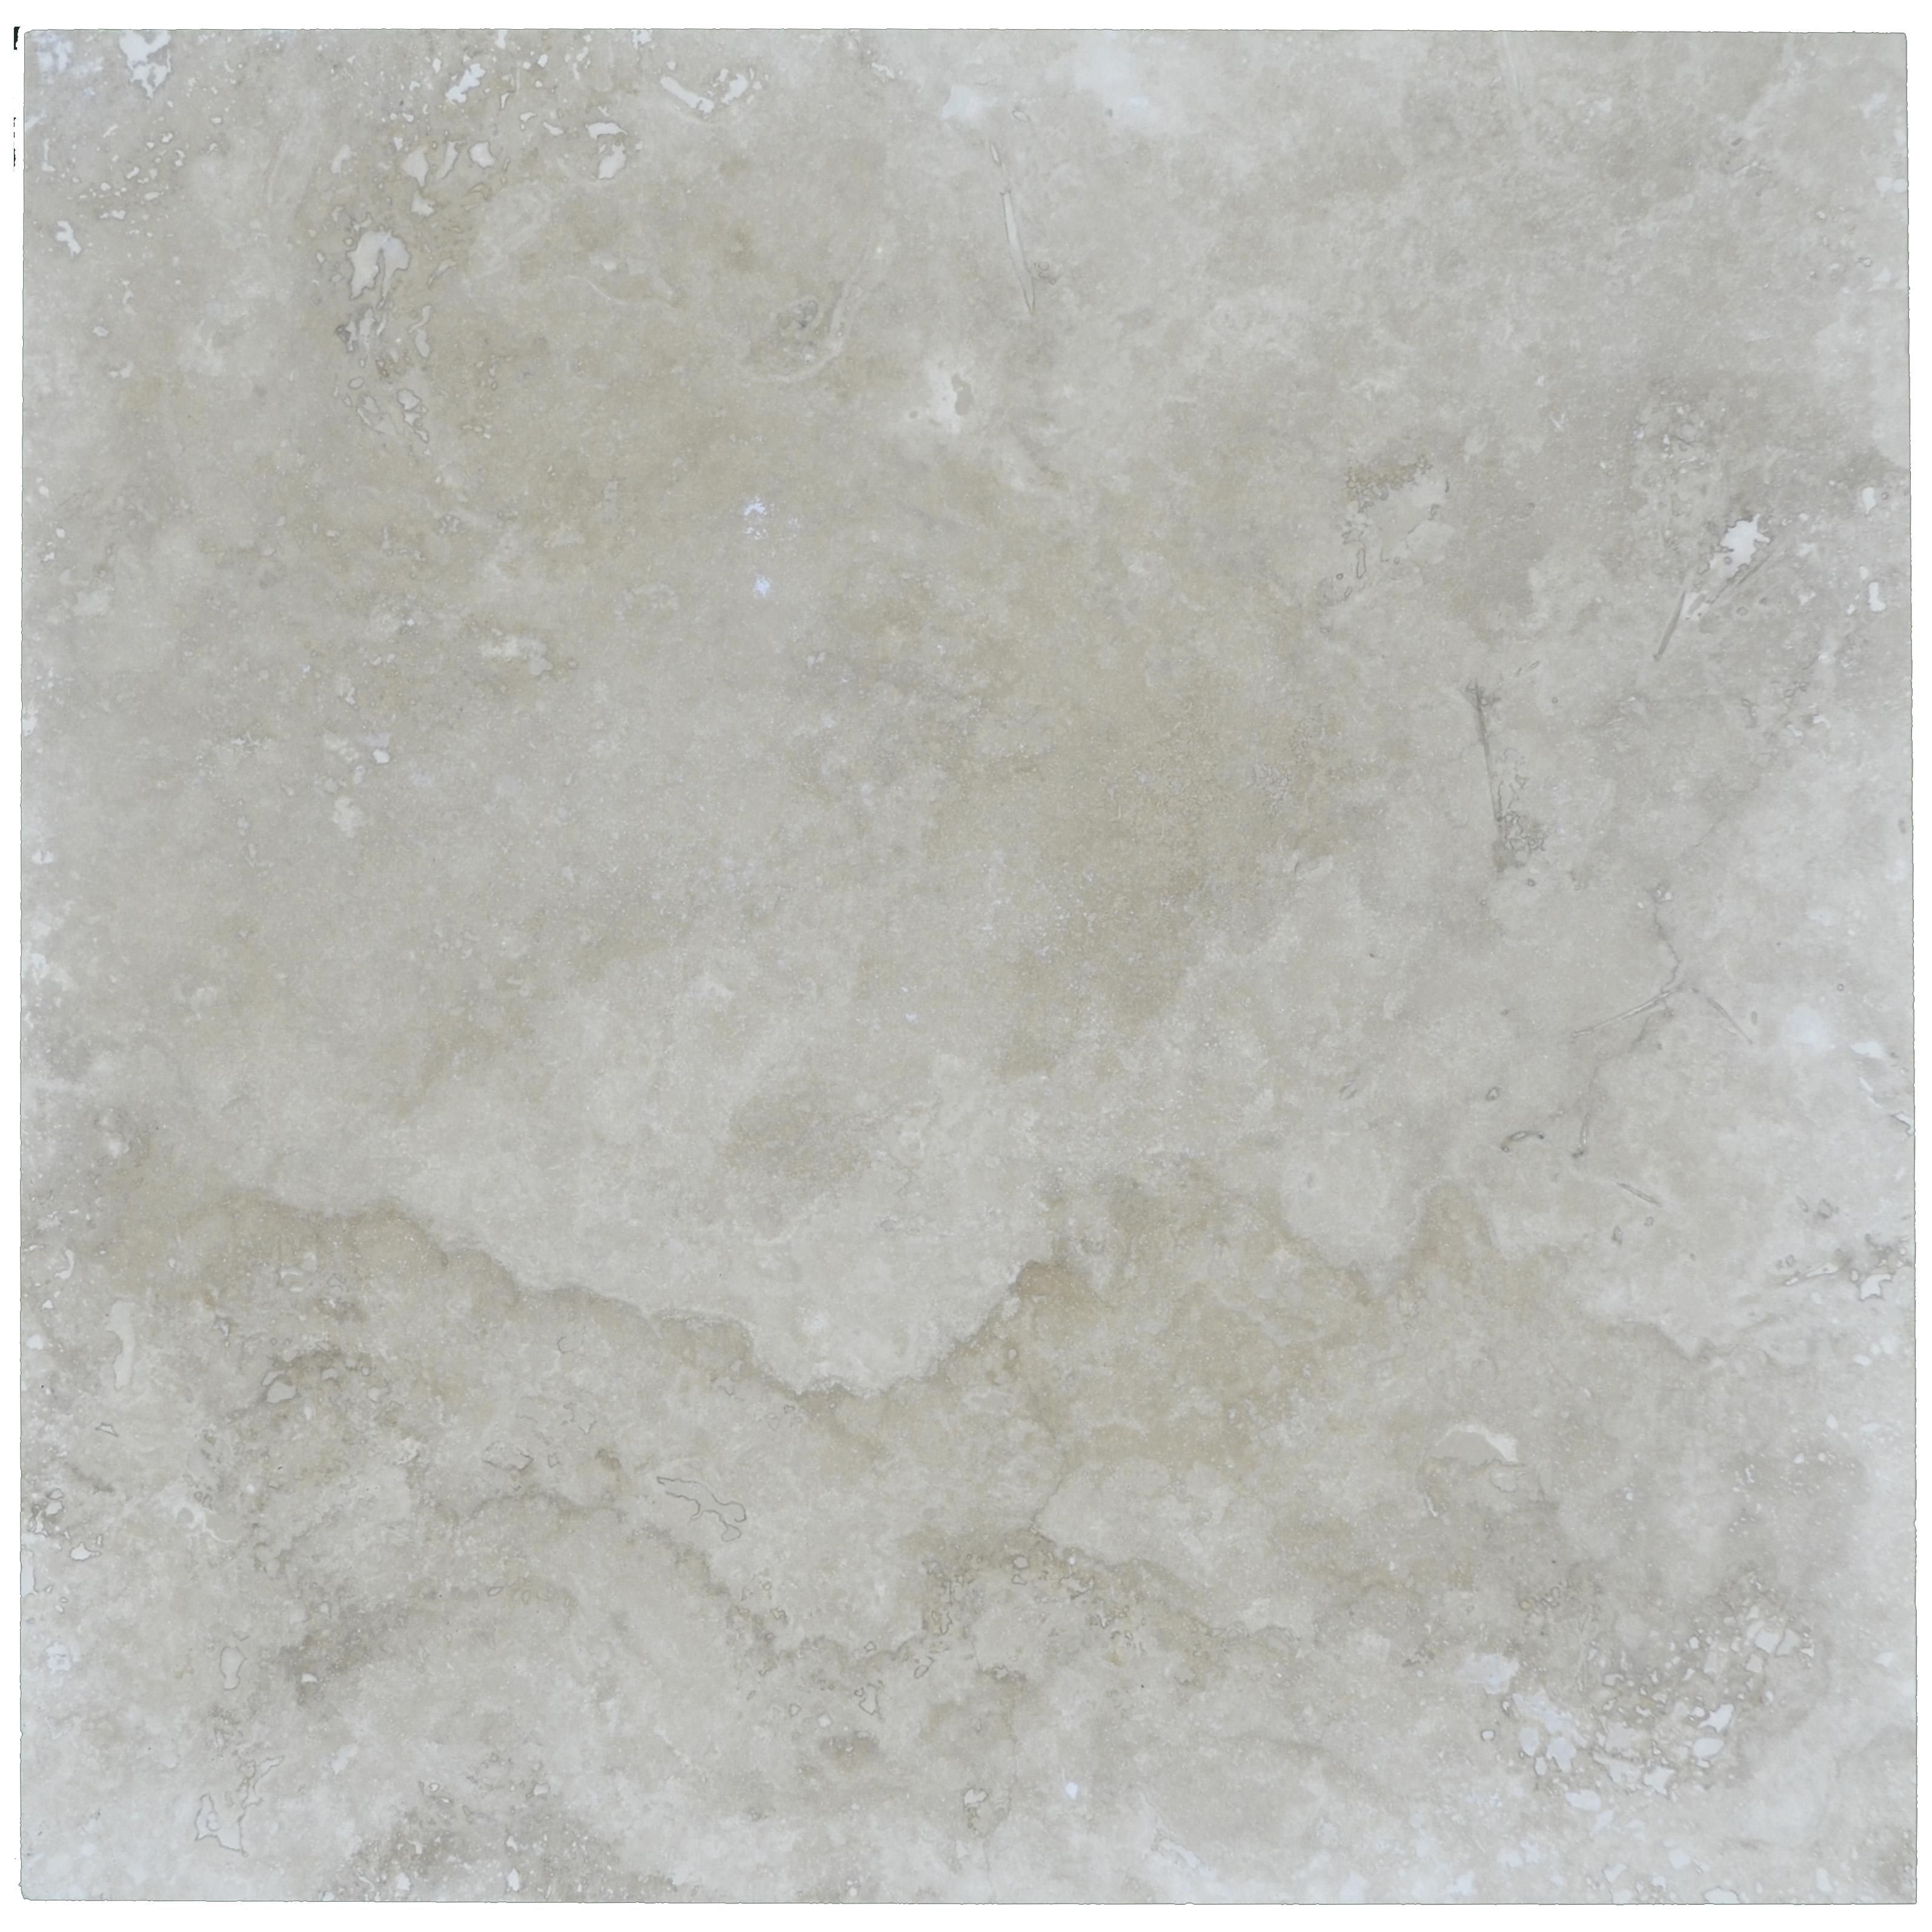 Ivory Classic Light Honed Filled Travertine Tiles 24x24-Travertine tiles sale-Atlantic Stone Source